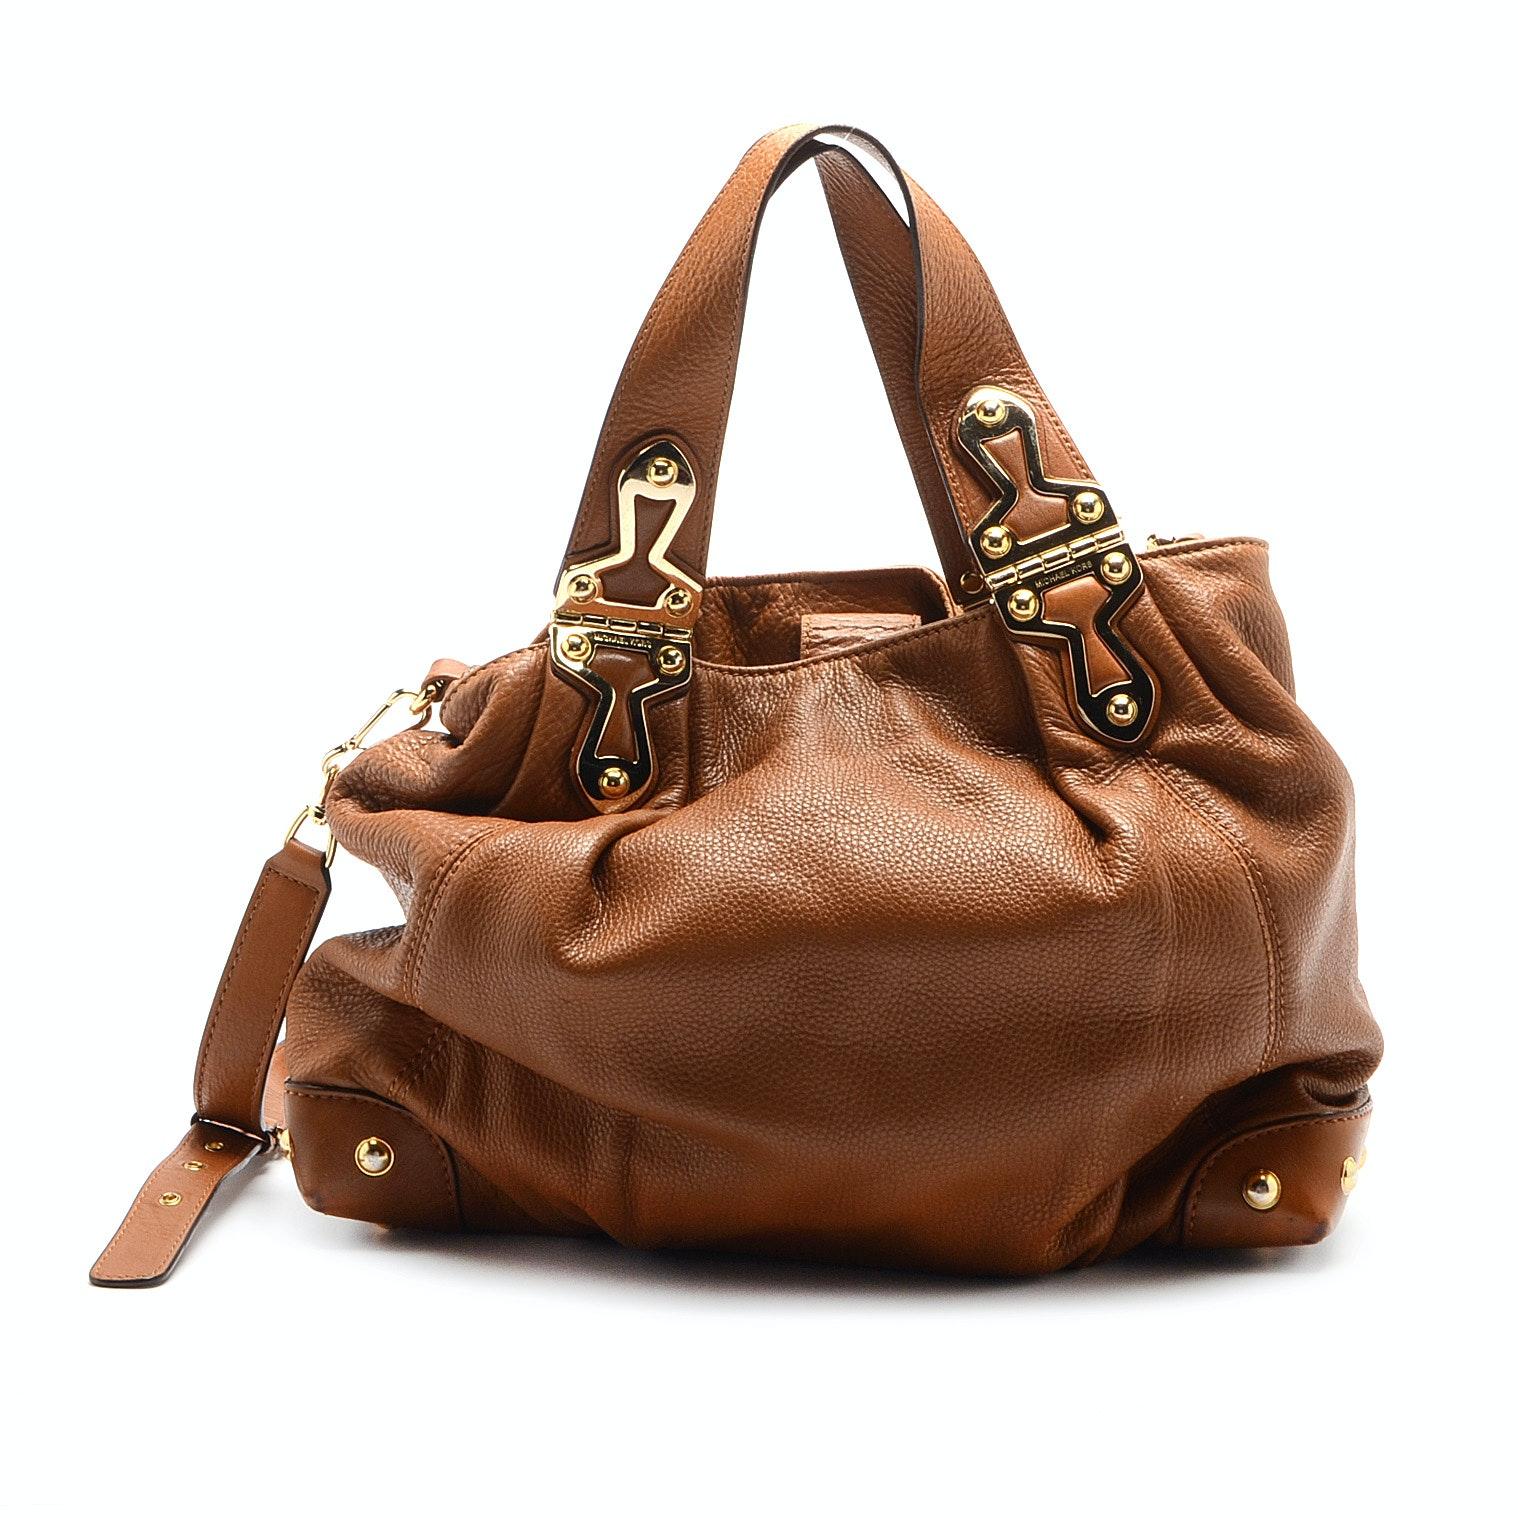 MICHAEL Michael Kors Tan Leather Satchel Handbag